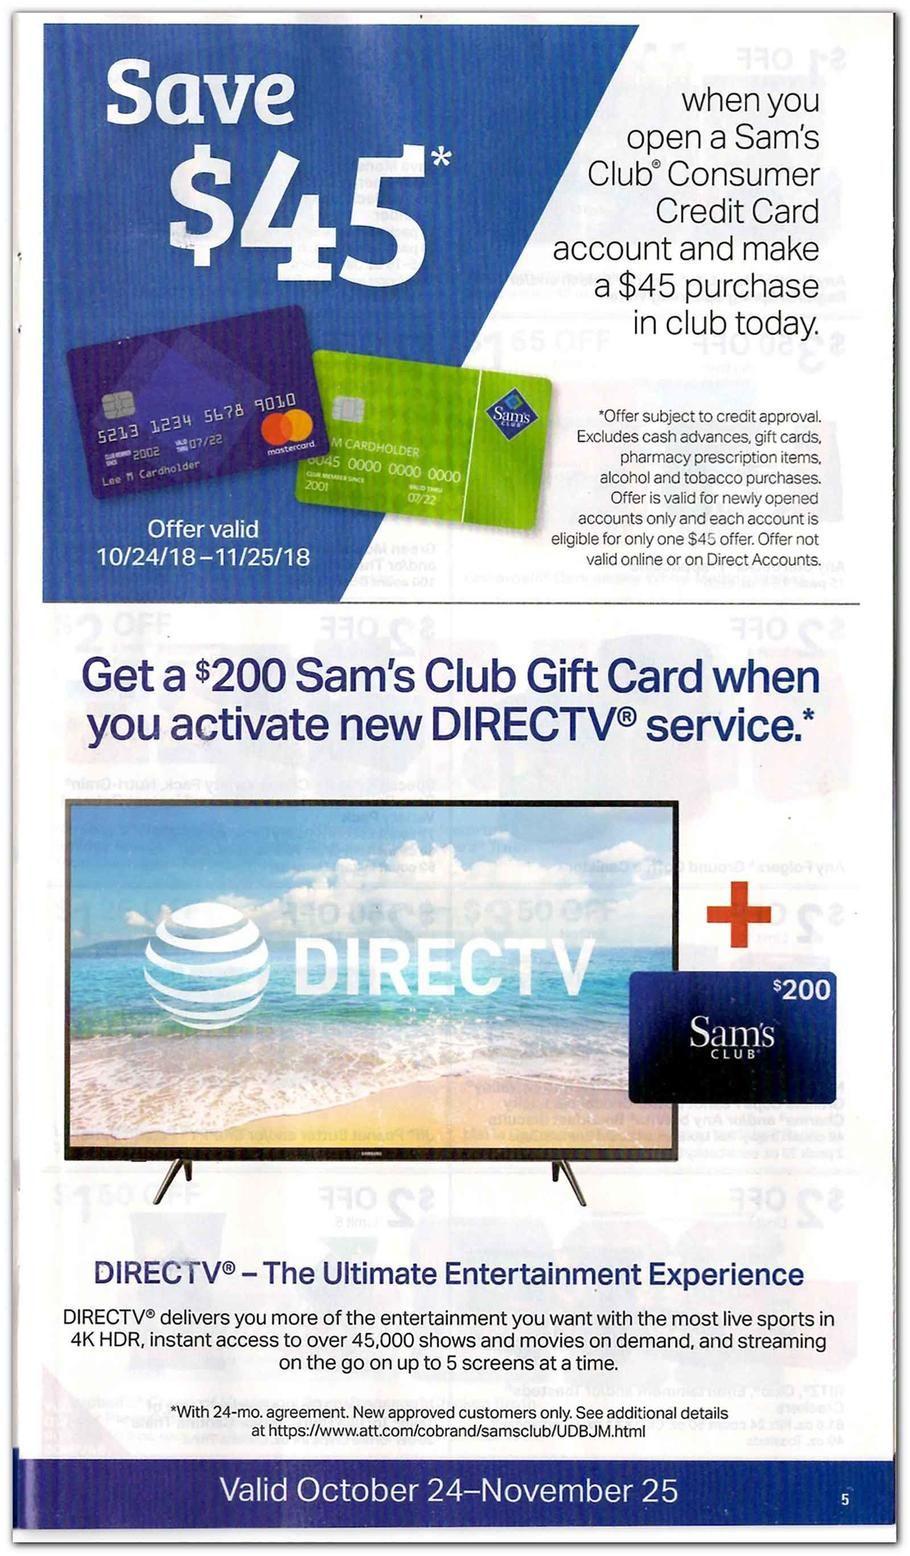 Sam S Club Featured 2018 Ads And Deals Sams Club Club Ads